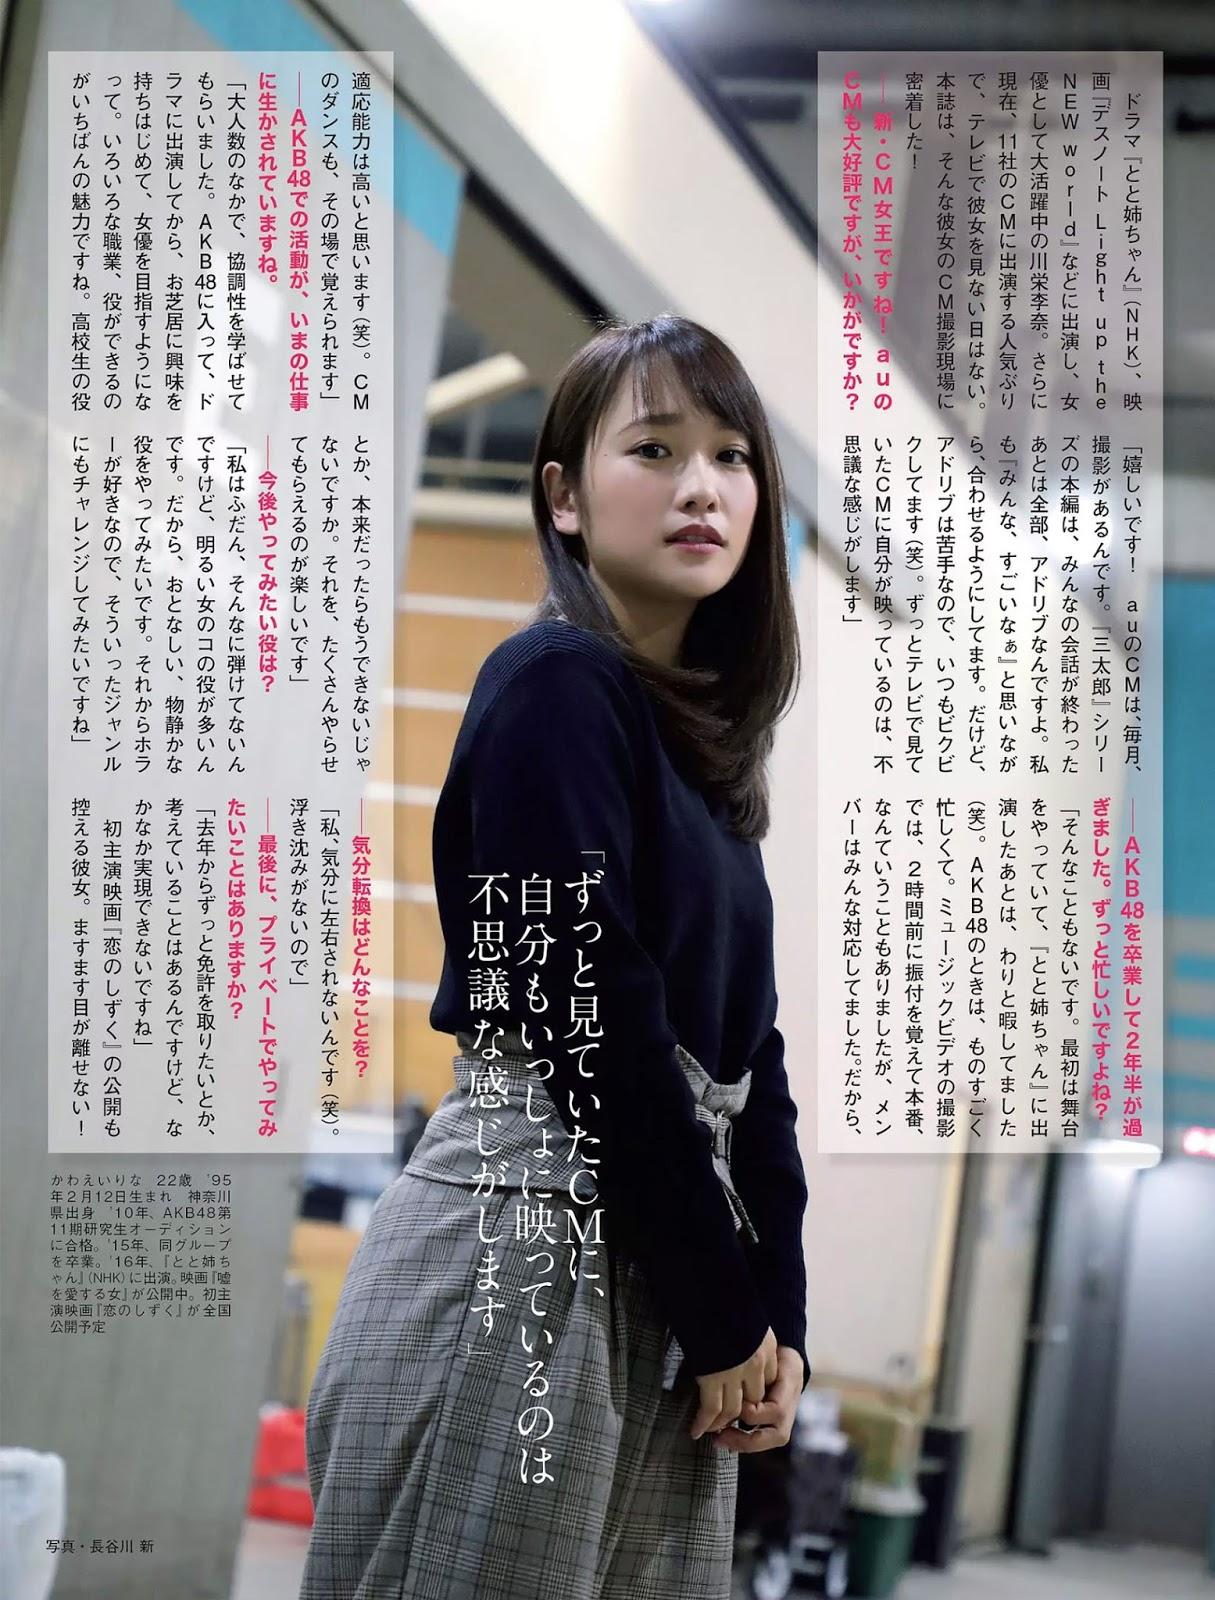 Kawaei Rina 川栄李奈, FLASH 2018.02.20 (フラッシュ 2018年2月2日号)